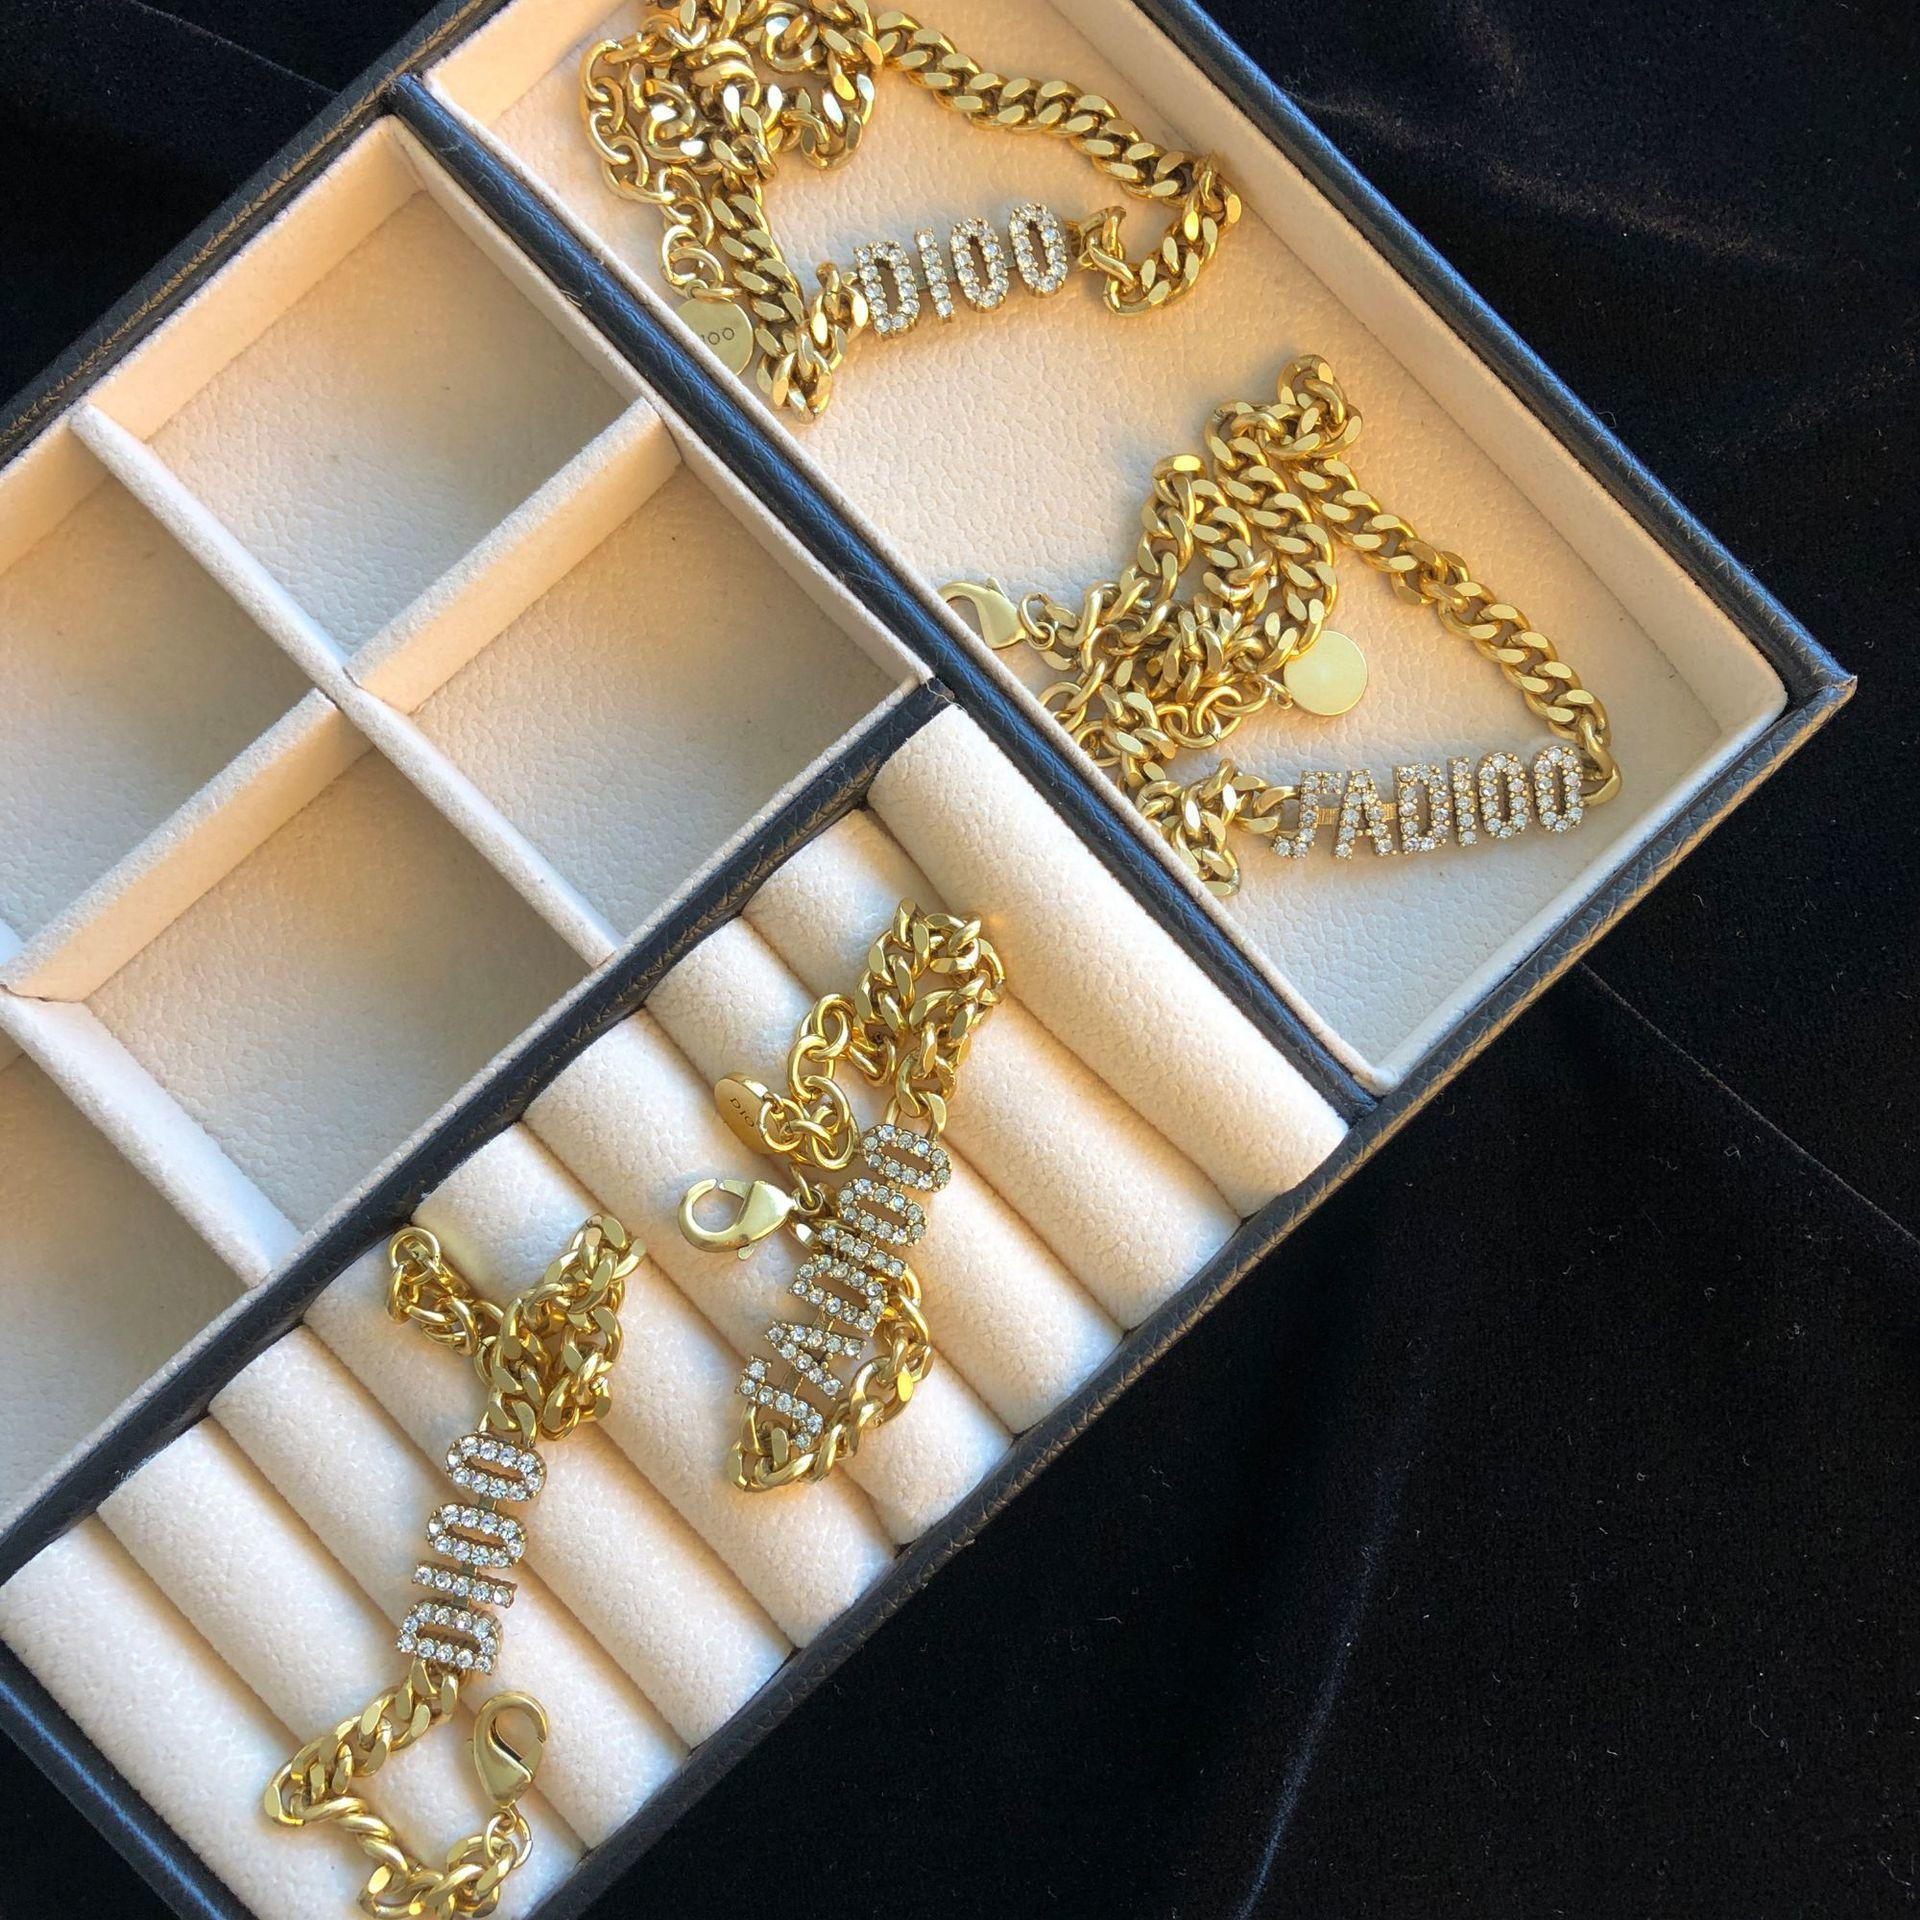 Bijoux de CD de luxe 2020 Neuf Diamond Lettre Collier Femme Dijia Internet Celebrity Classic Bracelet